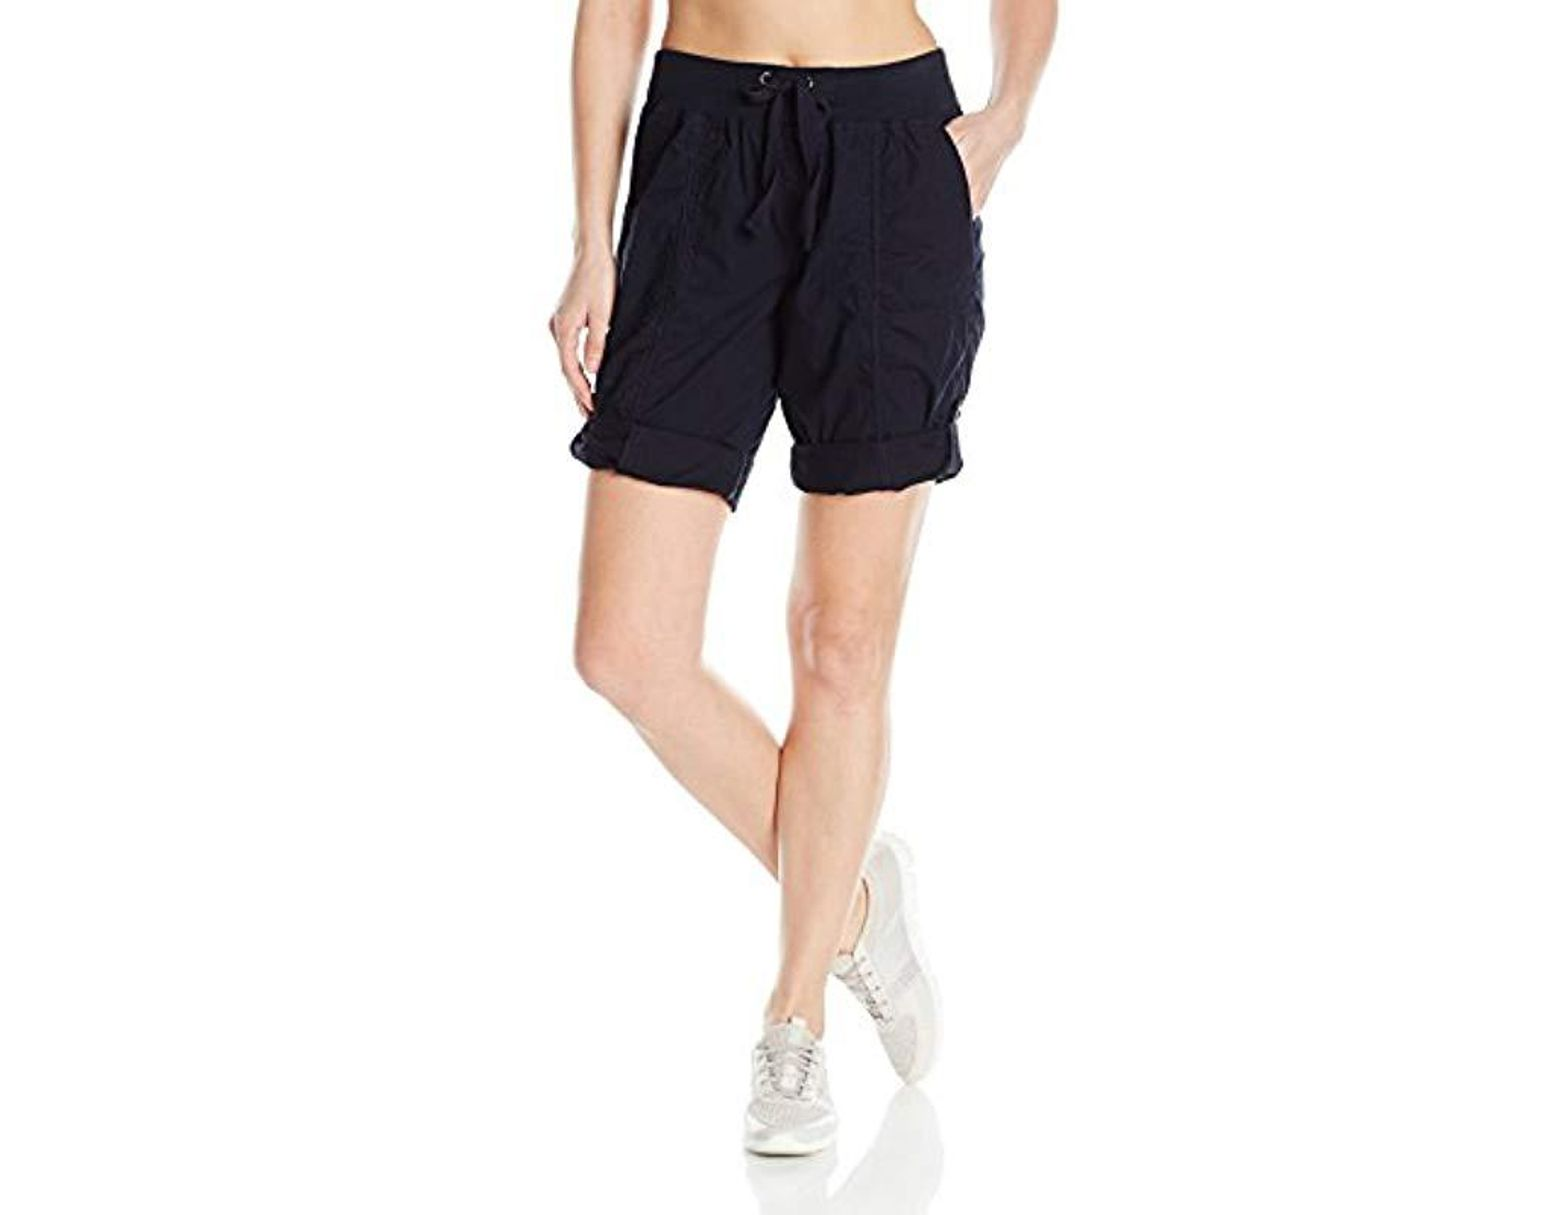 calvin klein women's performance shorts